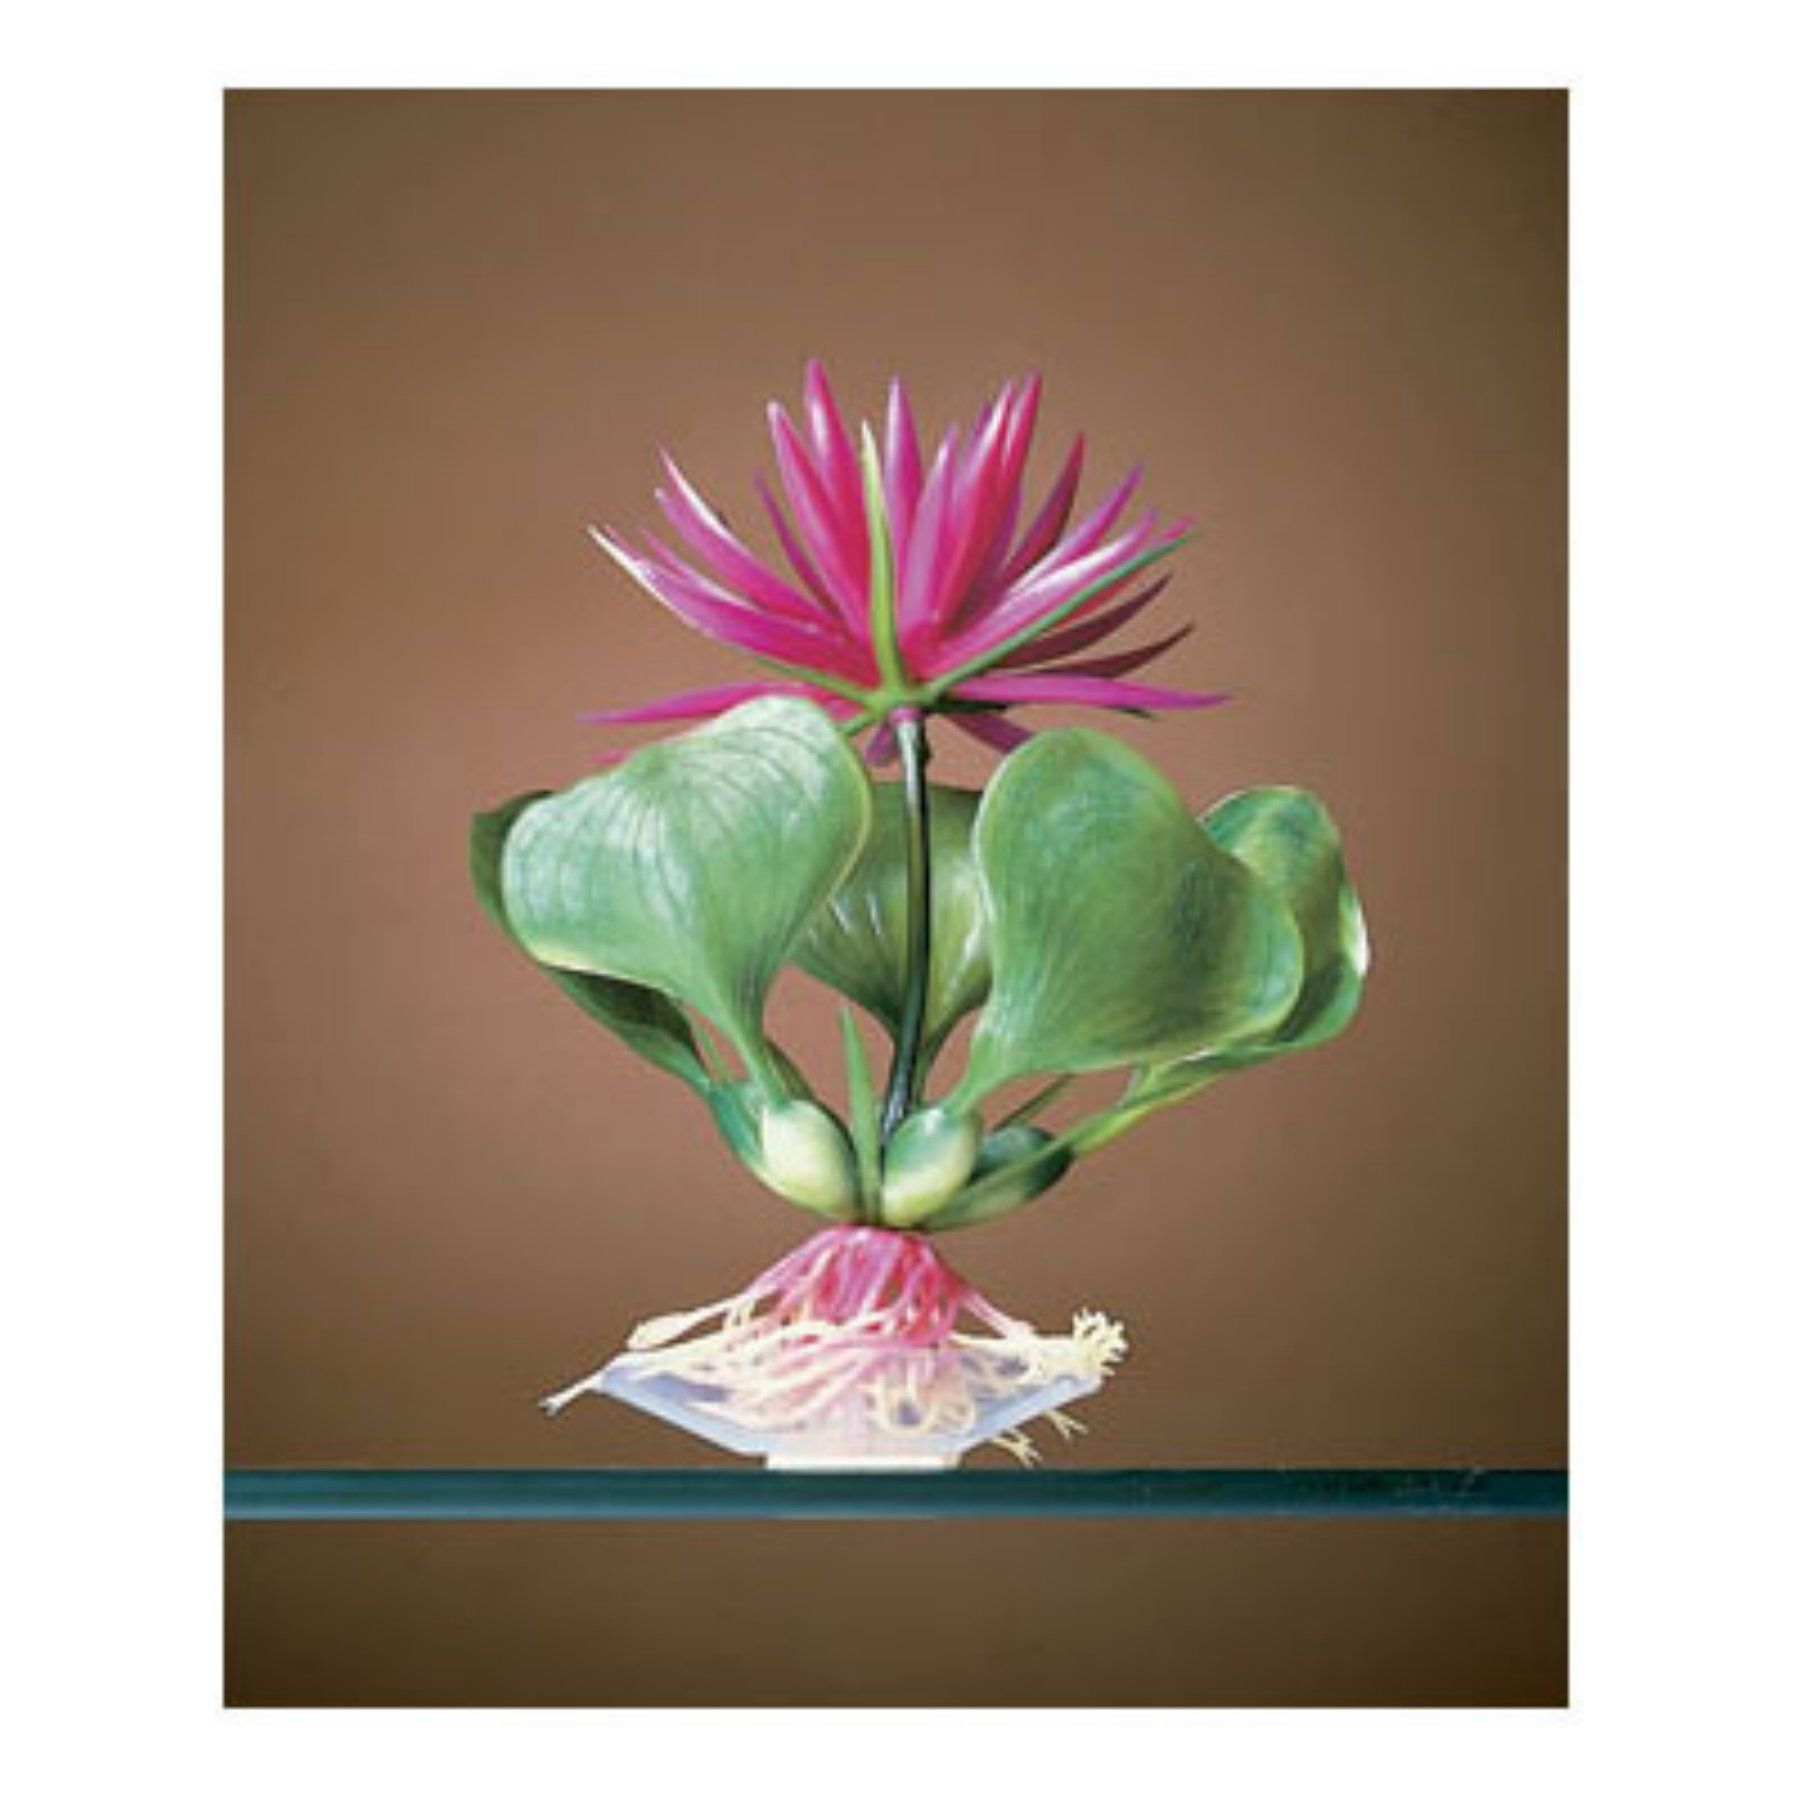 Aquaplants red water hyacinth aquarium plant pb products